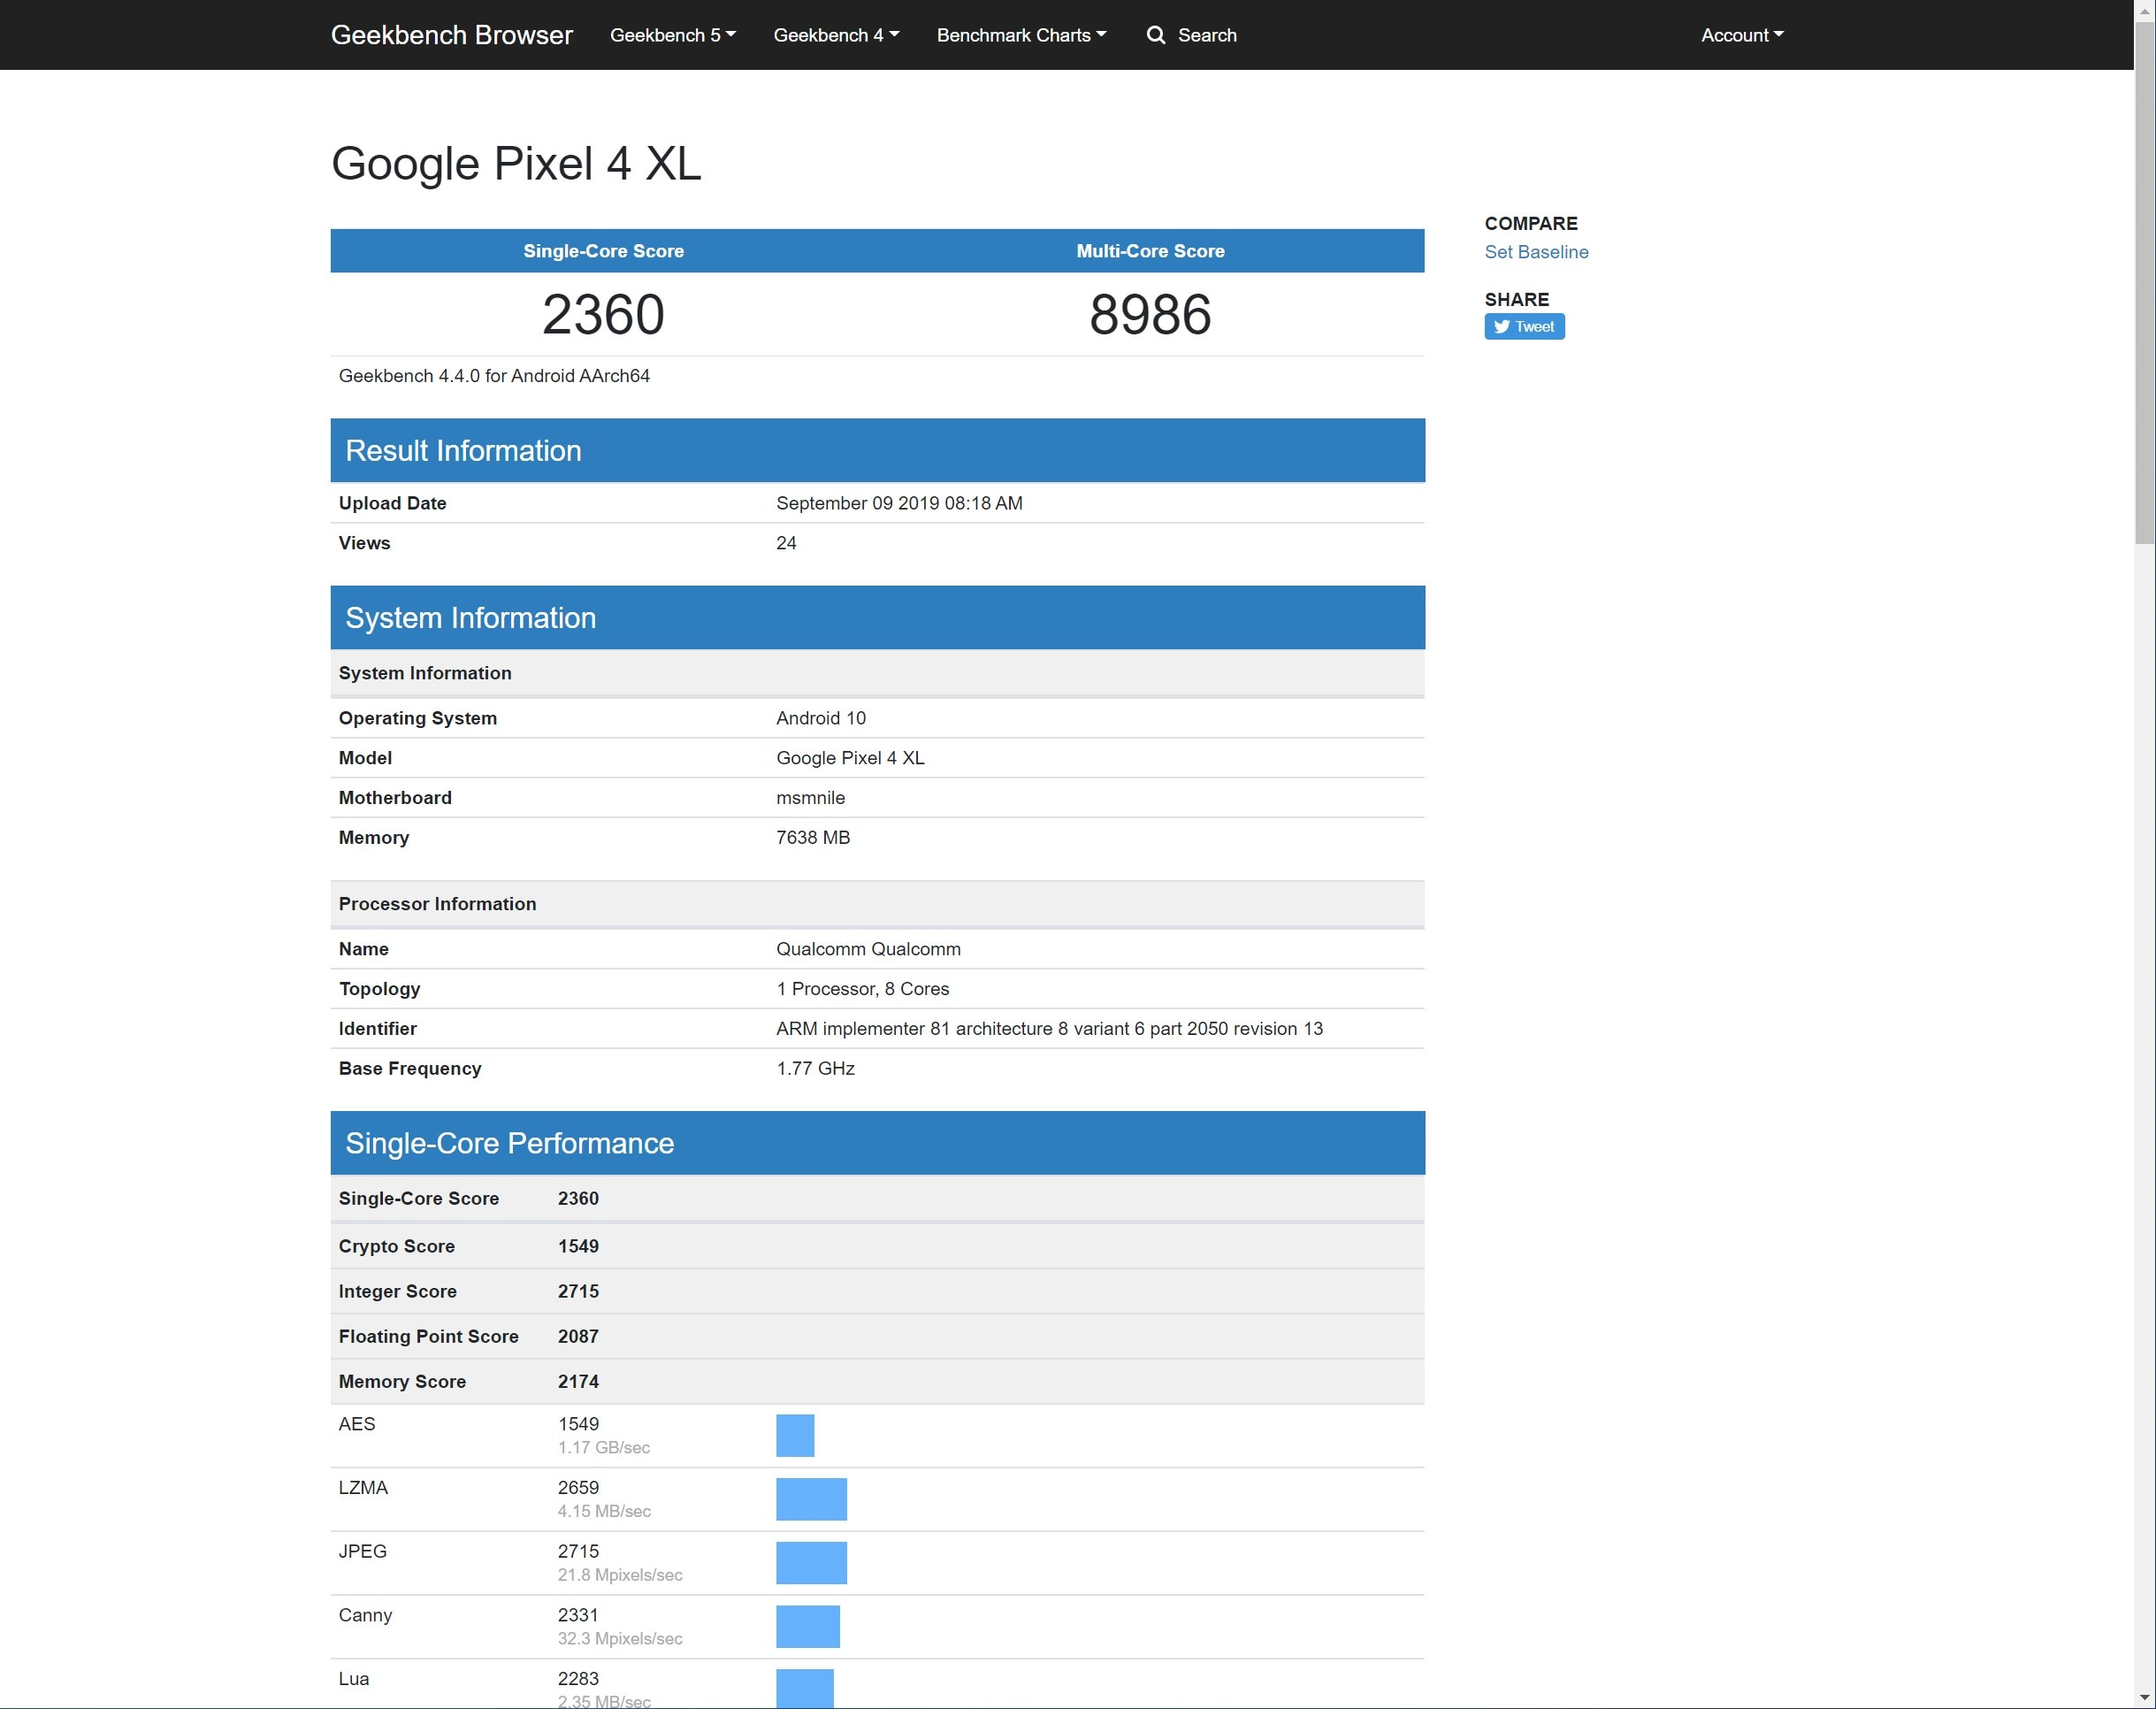 Google_Pixel_4_XL_-_Geekbench_Browser_-_Google_Chr-16_44_32